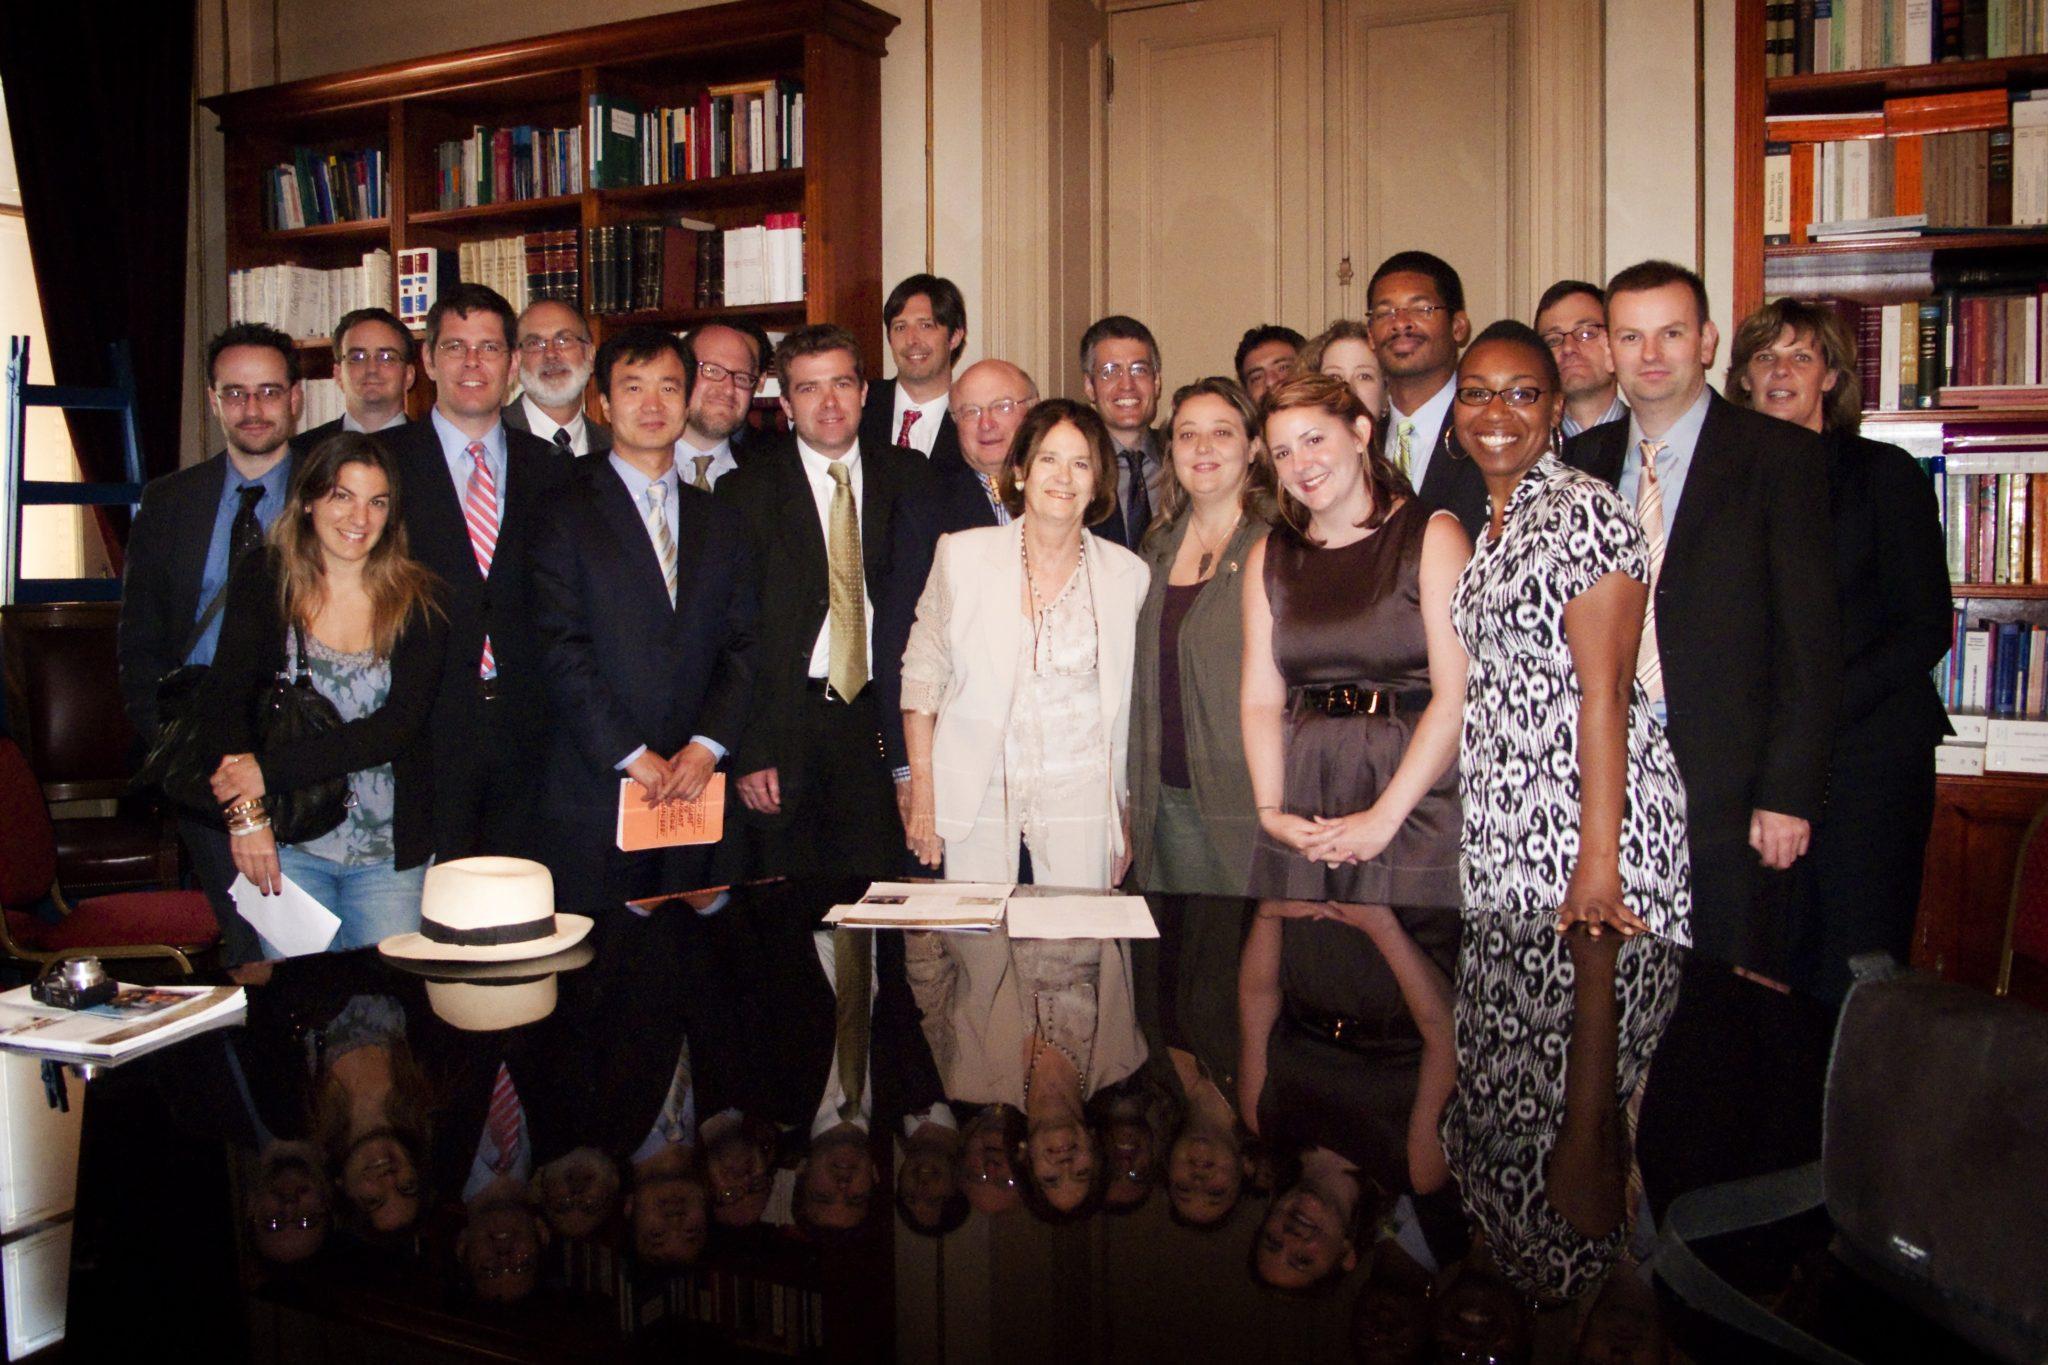 Knight-Wallace Fellows 2011